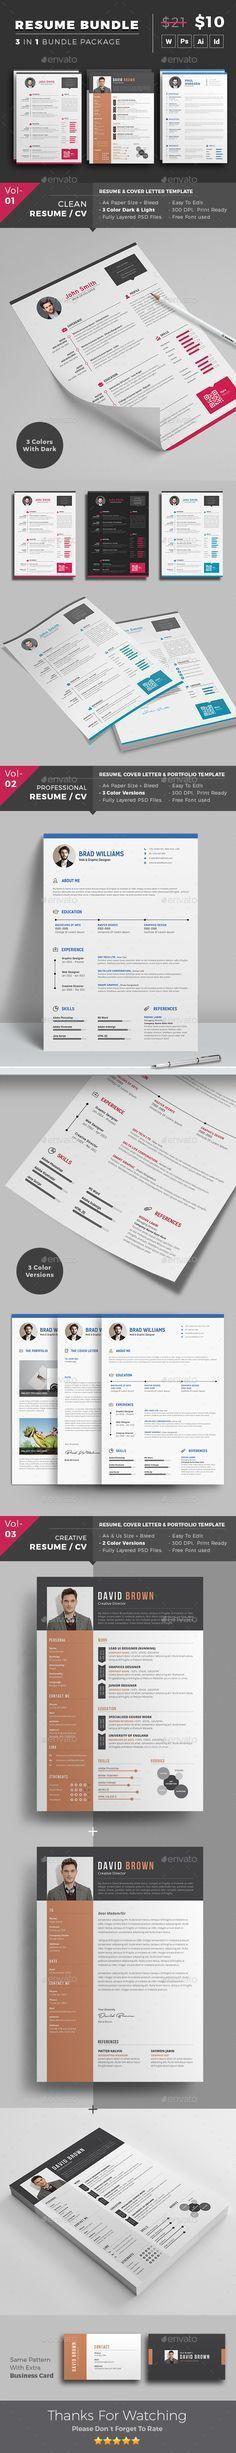 Amanda Resume/CV Template Word Photoshop InDesign | Resume ...